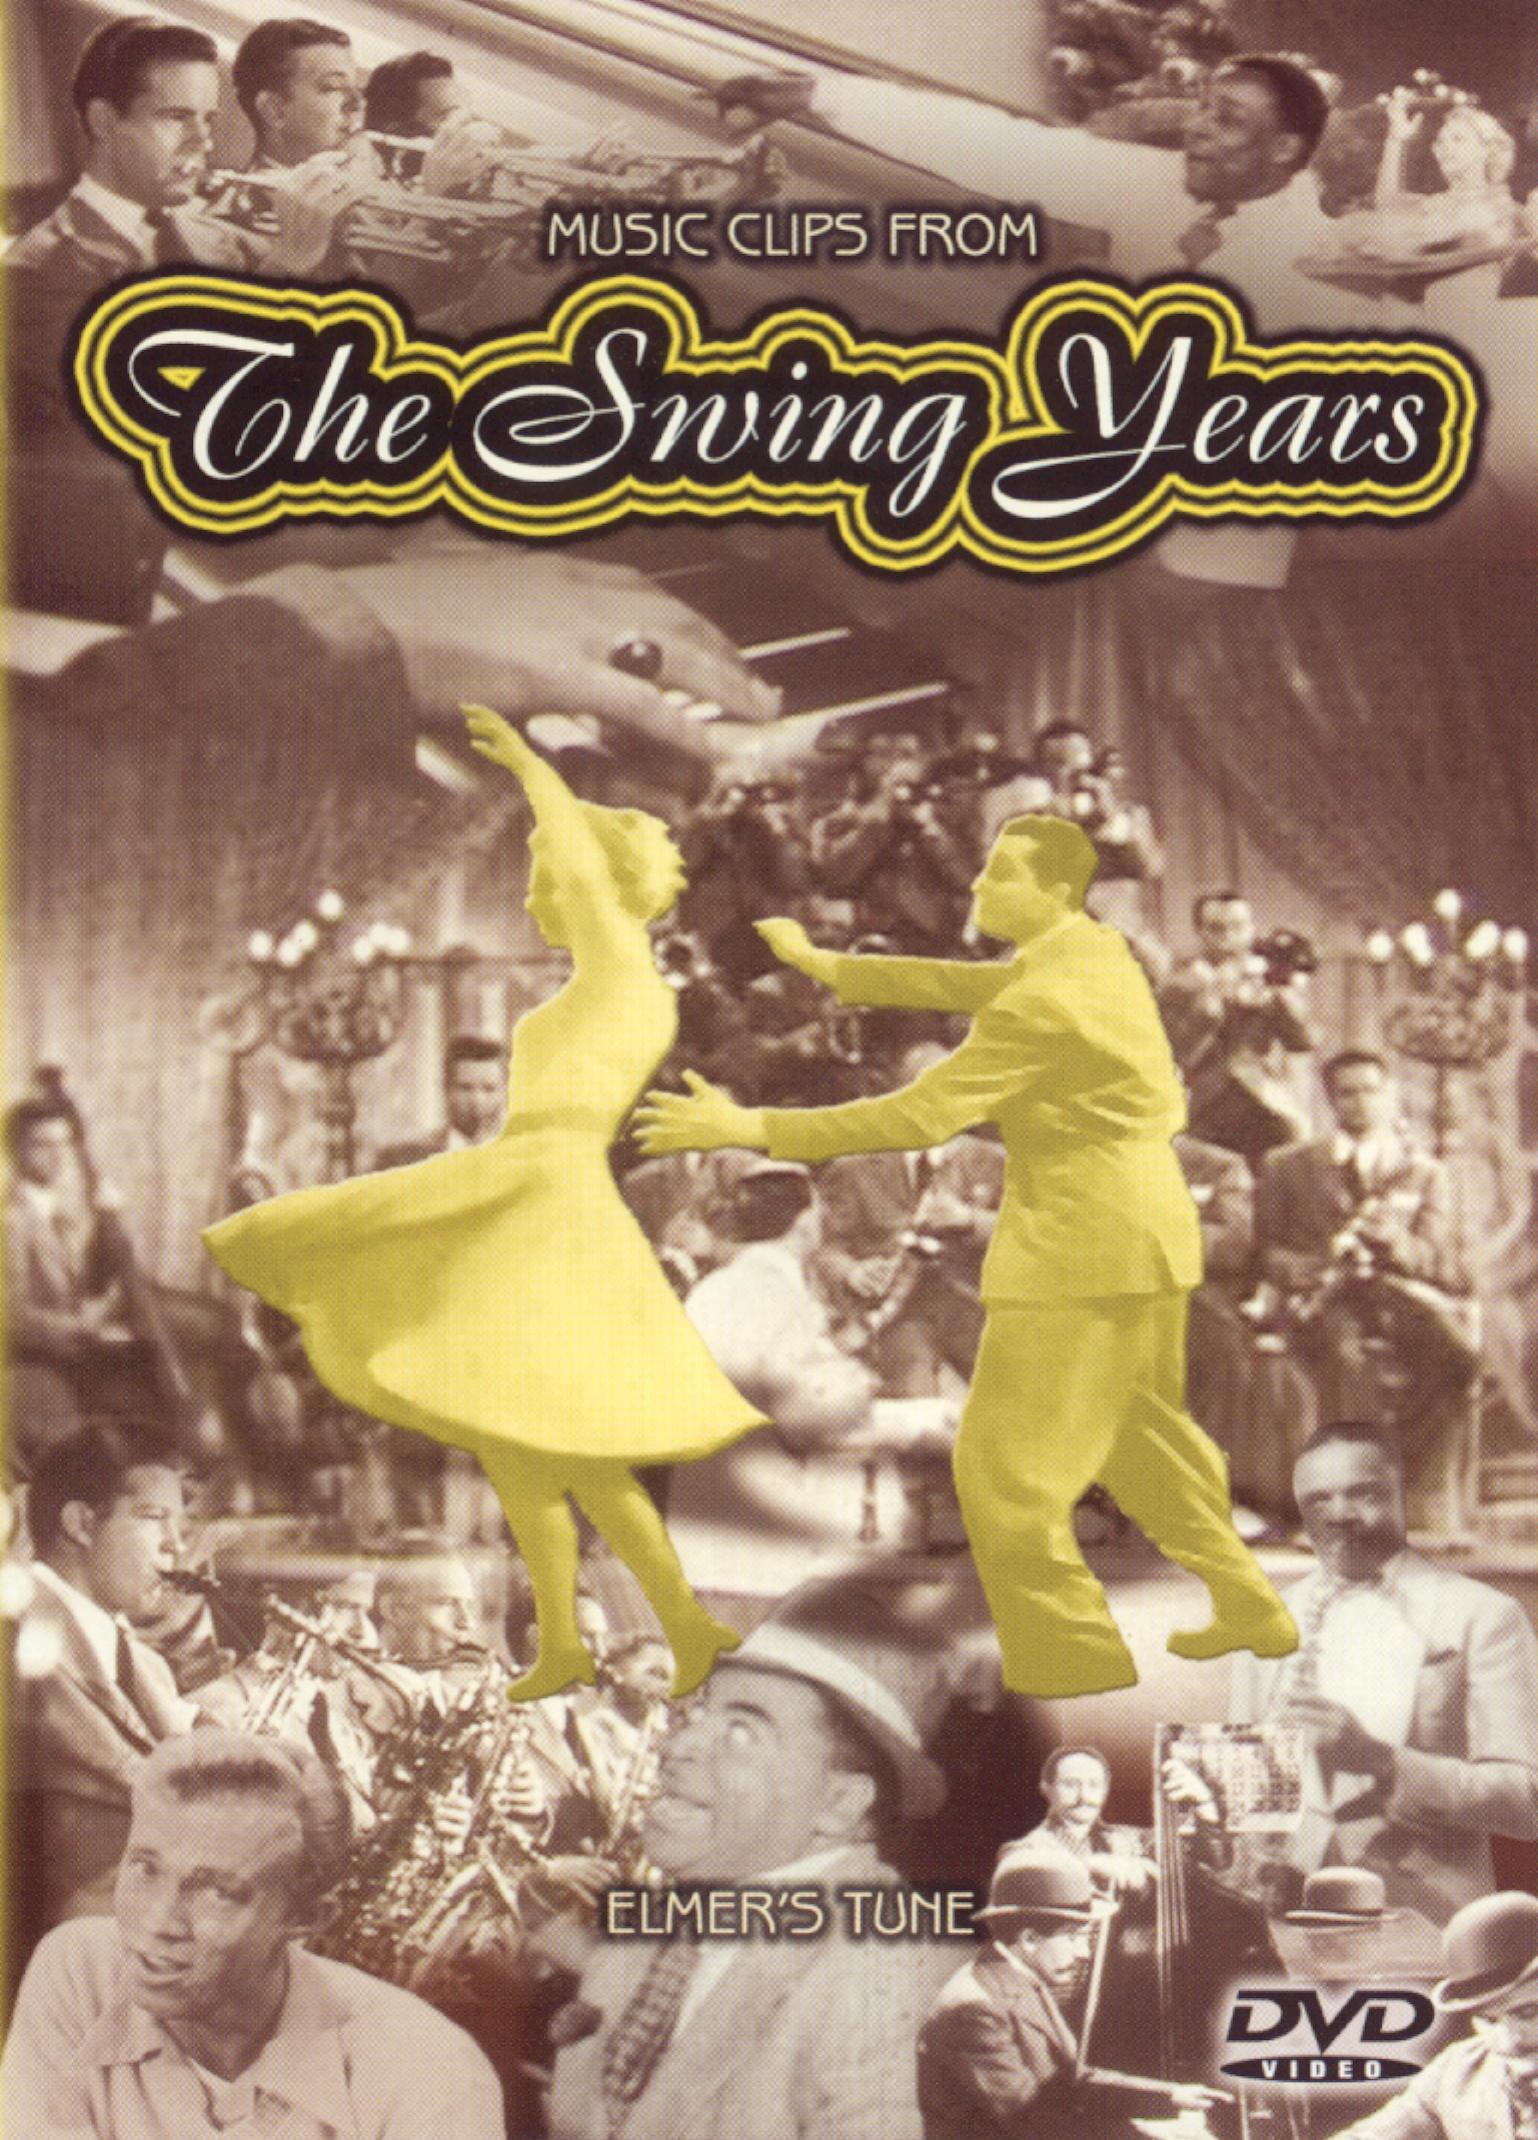 The Swing Years: Elmer's Tune